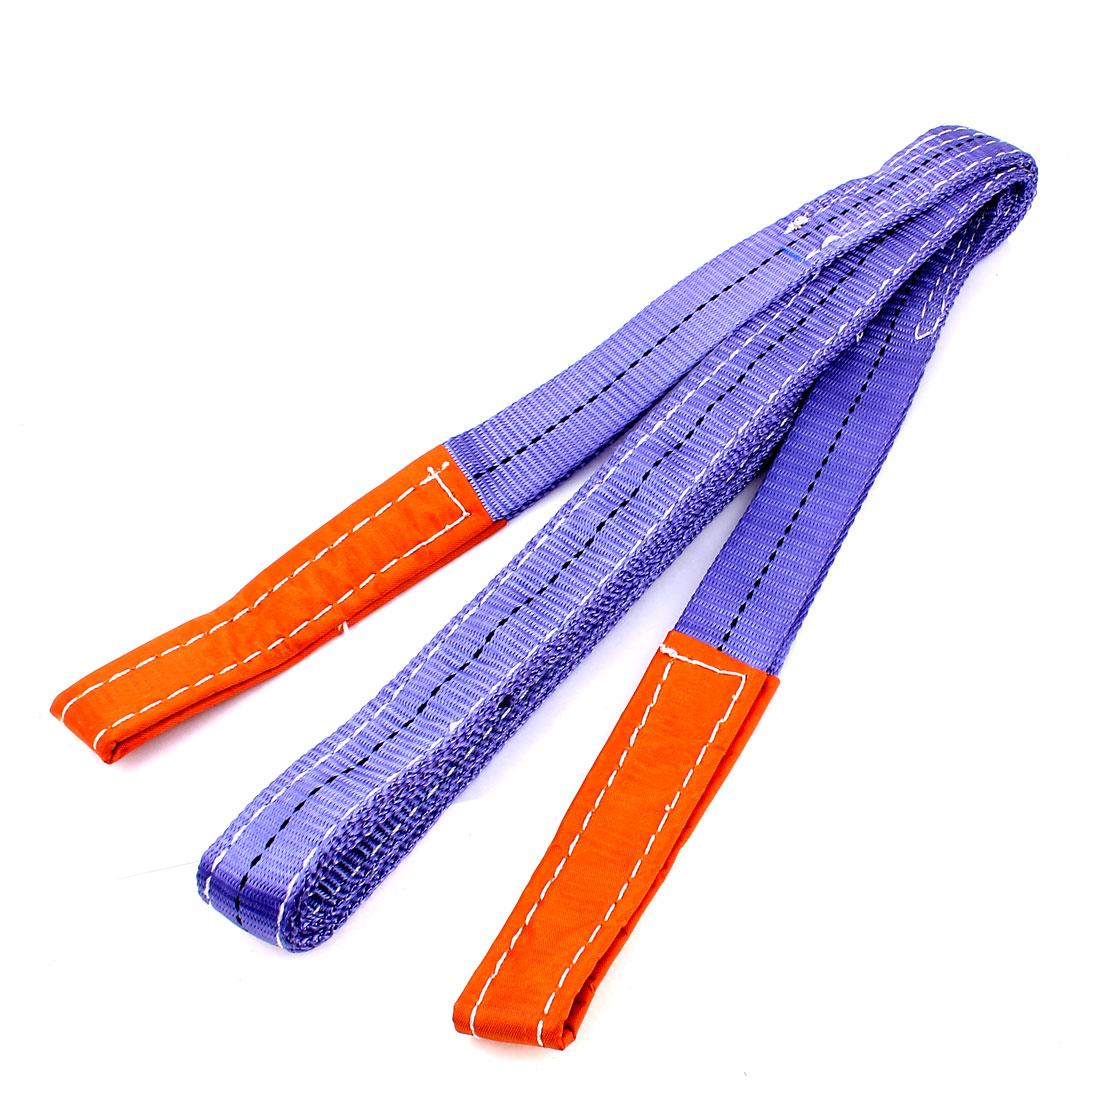 3 Meter 35mm Width Eye to Eye Nylon Web Lifting Tow Strap Purple